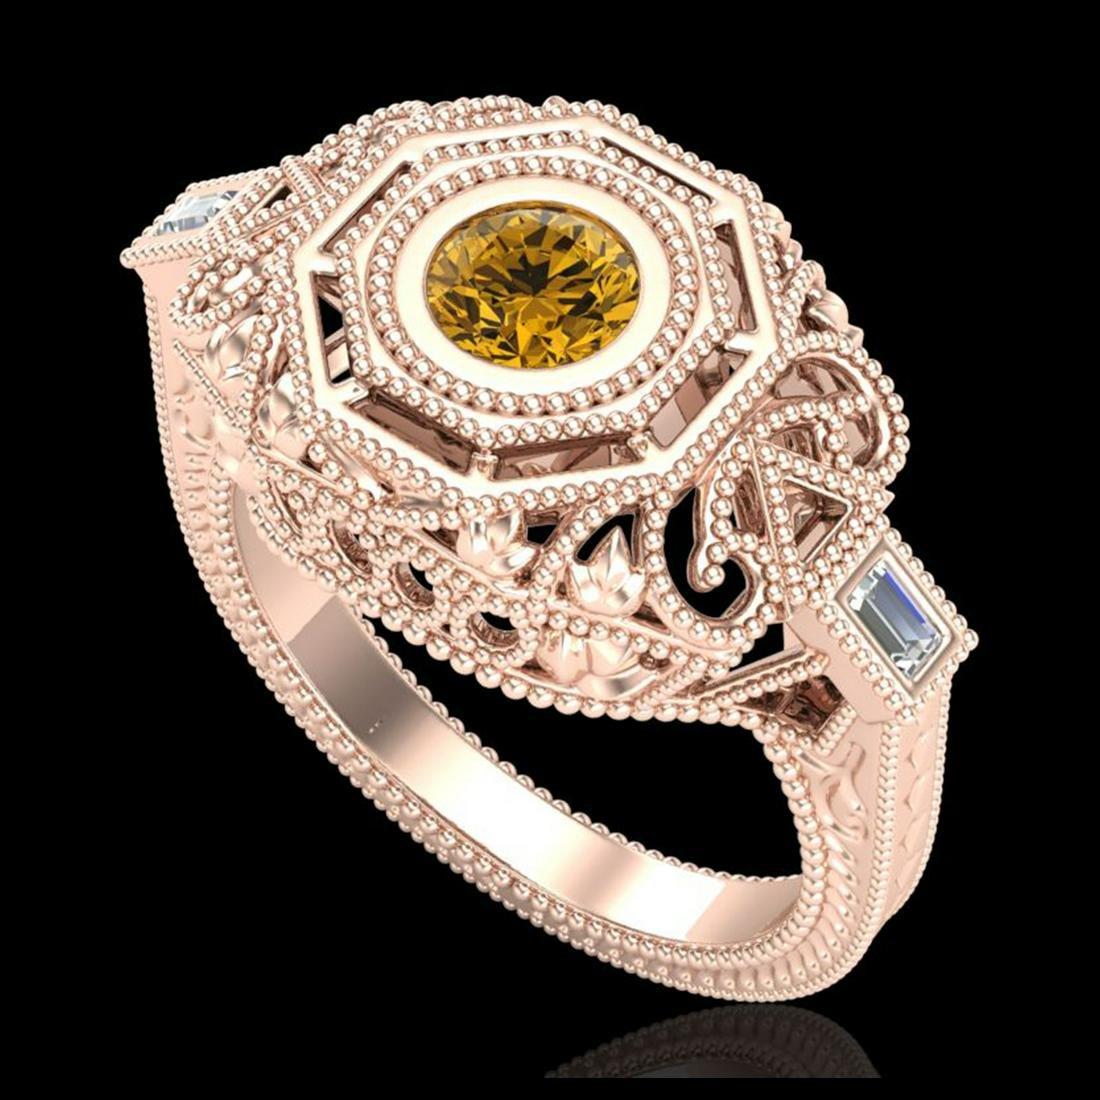 0.75 ctw Intense Fancy Yellow Diamond Art Deco Ring 18K